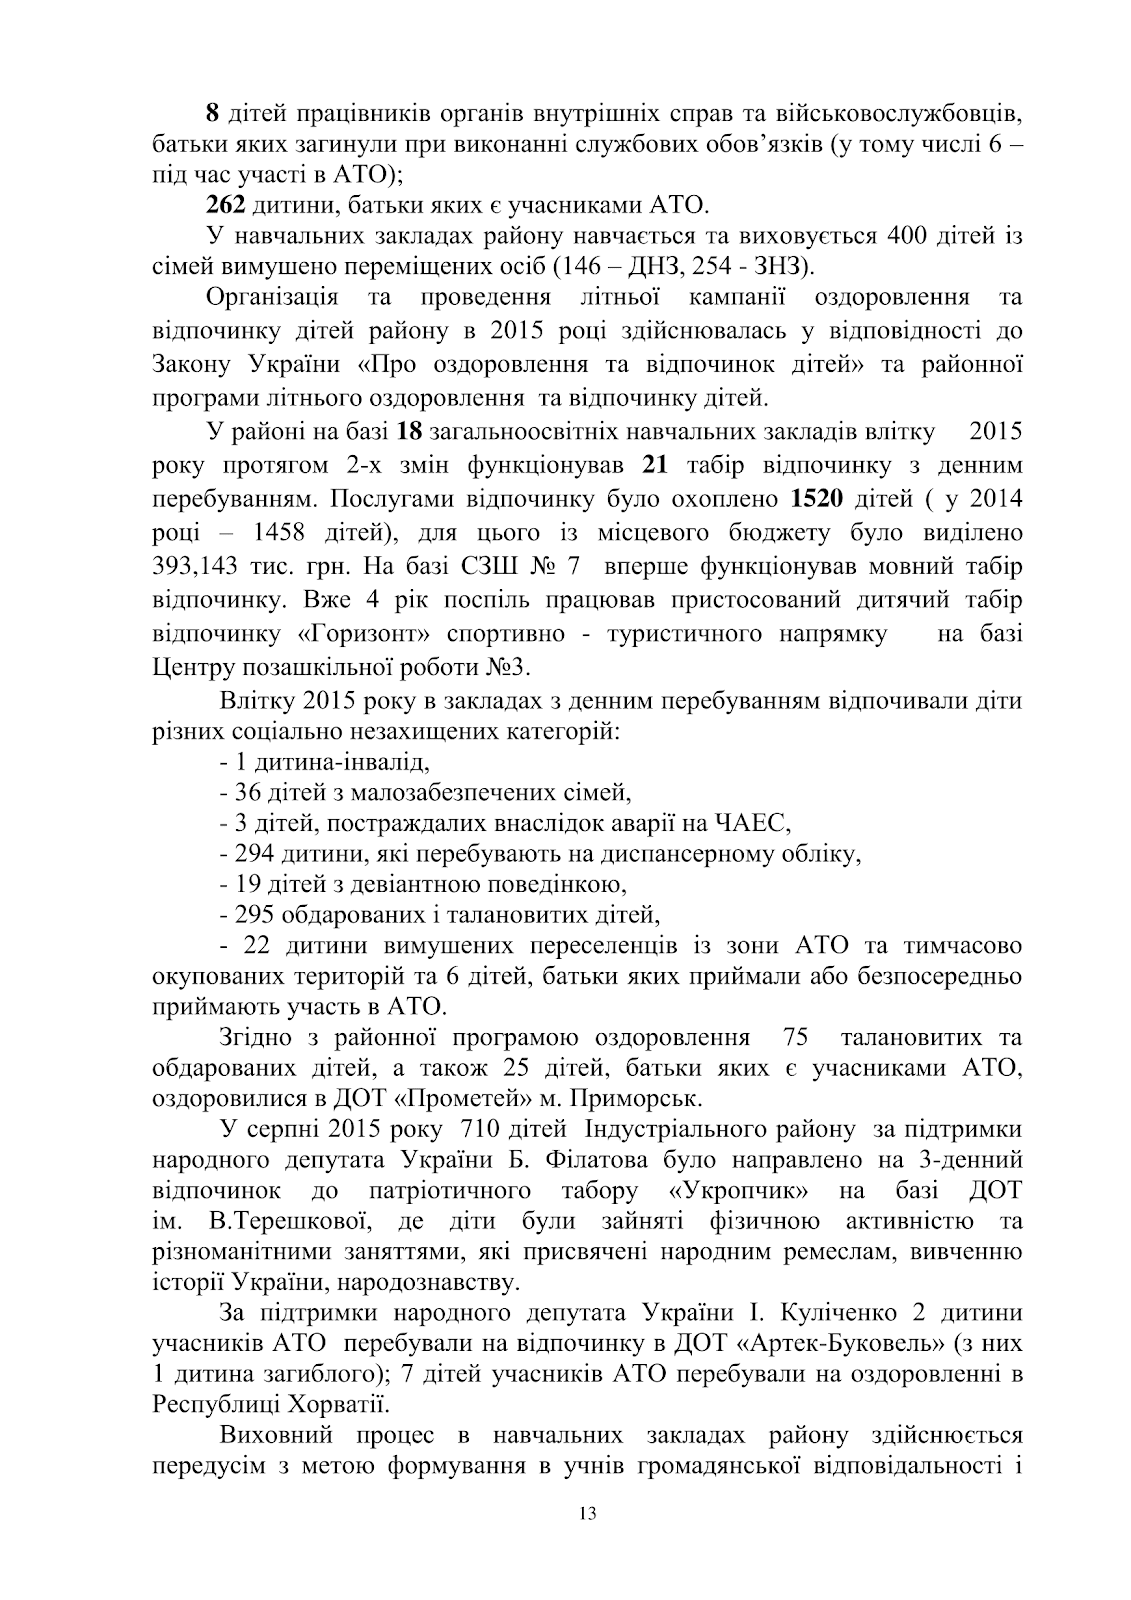 C:\Users\Валерия\Desktop\план 2016 рік\план 2016 рік-013.png